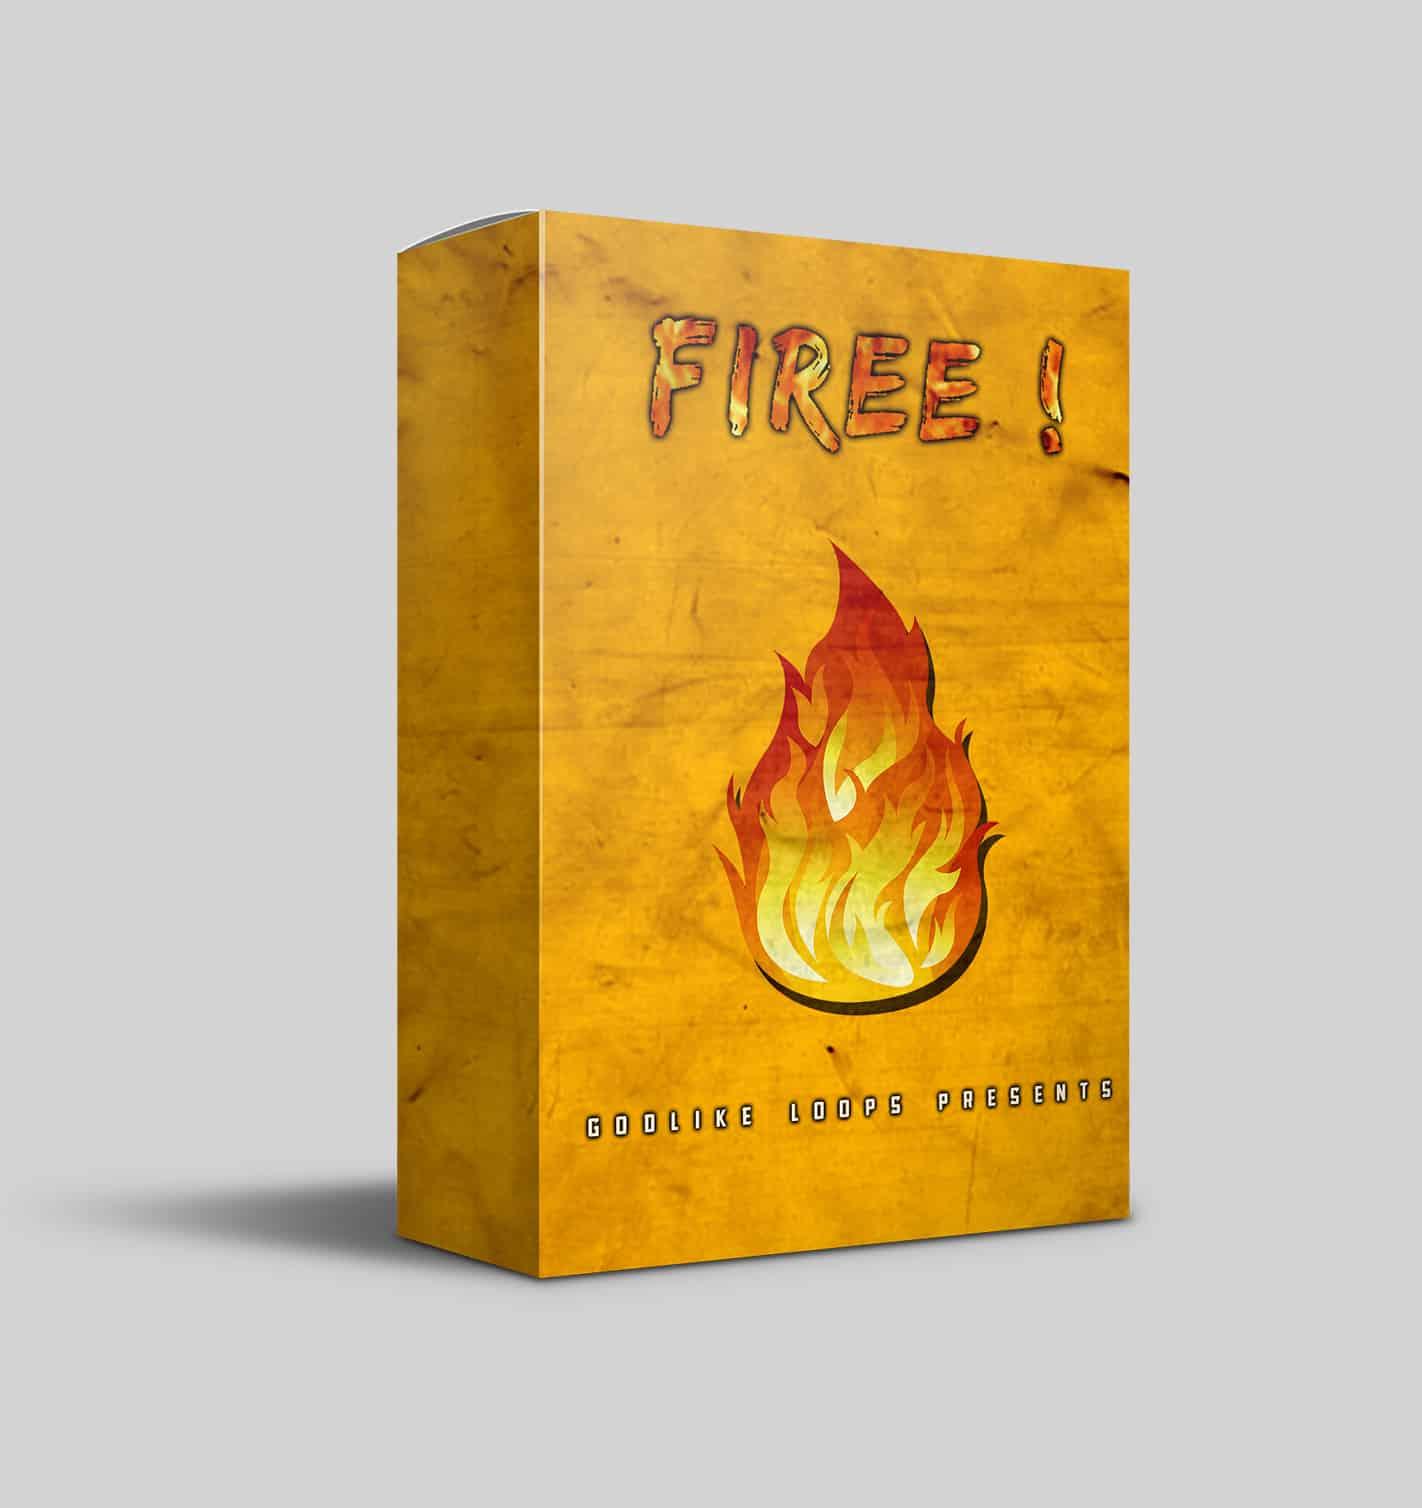 Godlike Loops - Firee Construction Kit